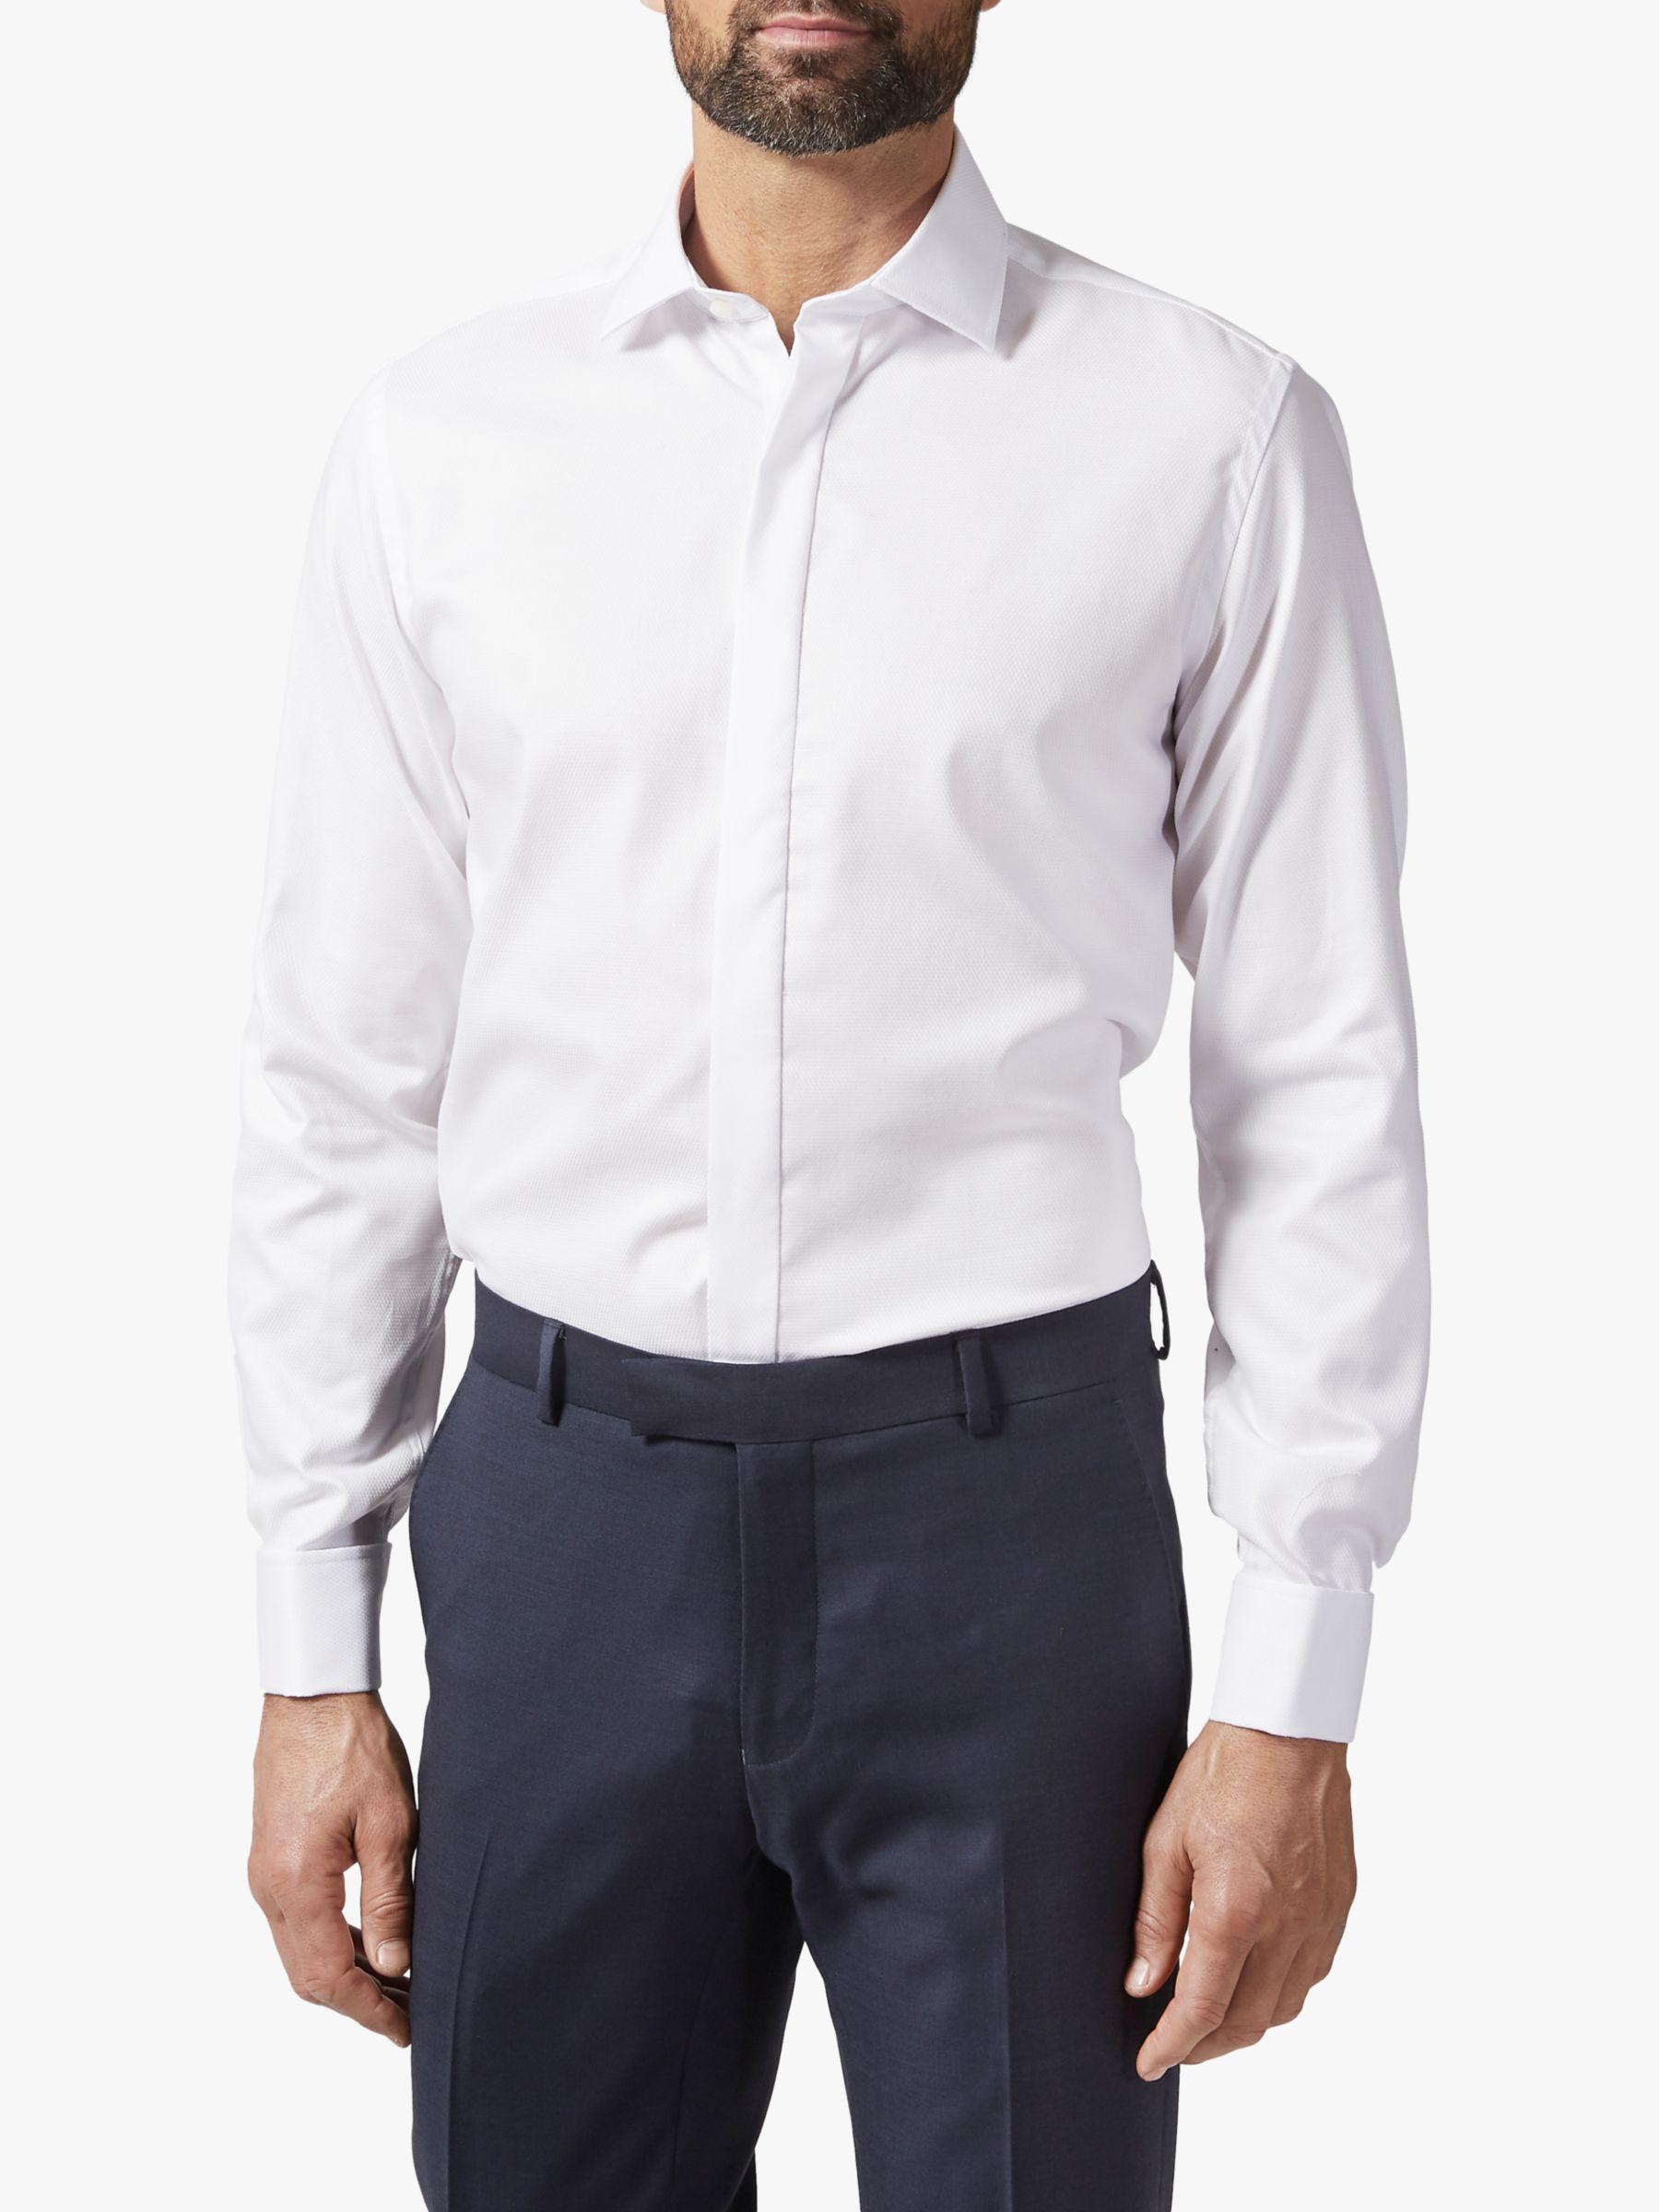 Richard James Mayfair Richard James Mayfair Twill Shirt, White